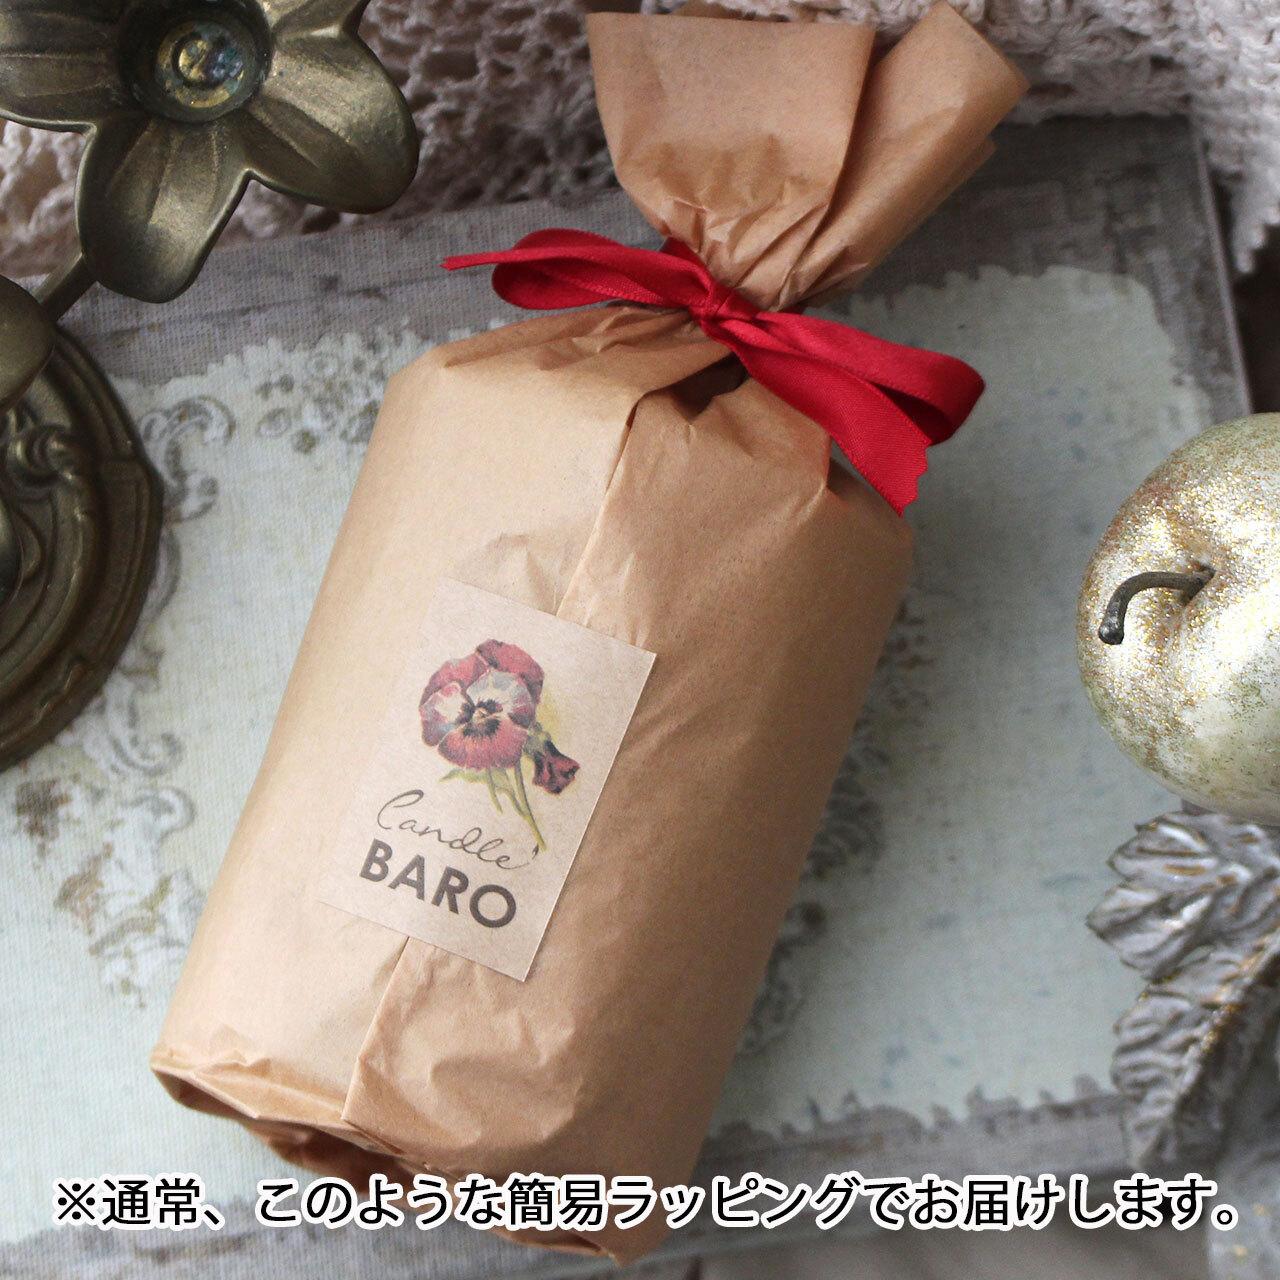 【UROCO】ピラーキャンドル UP005